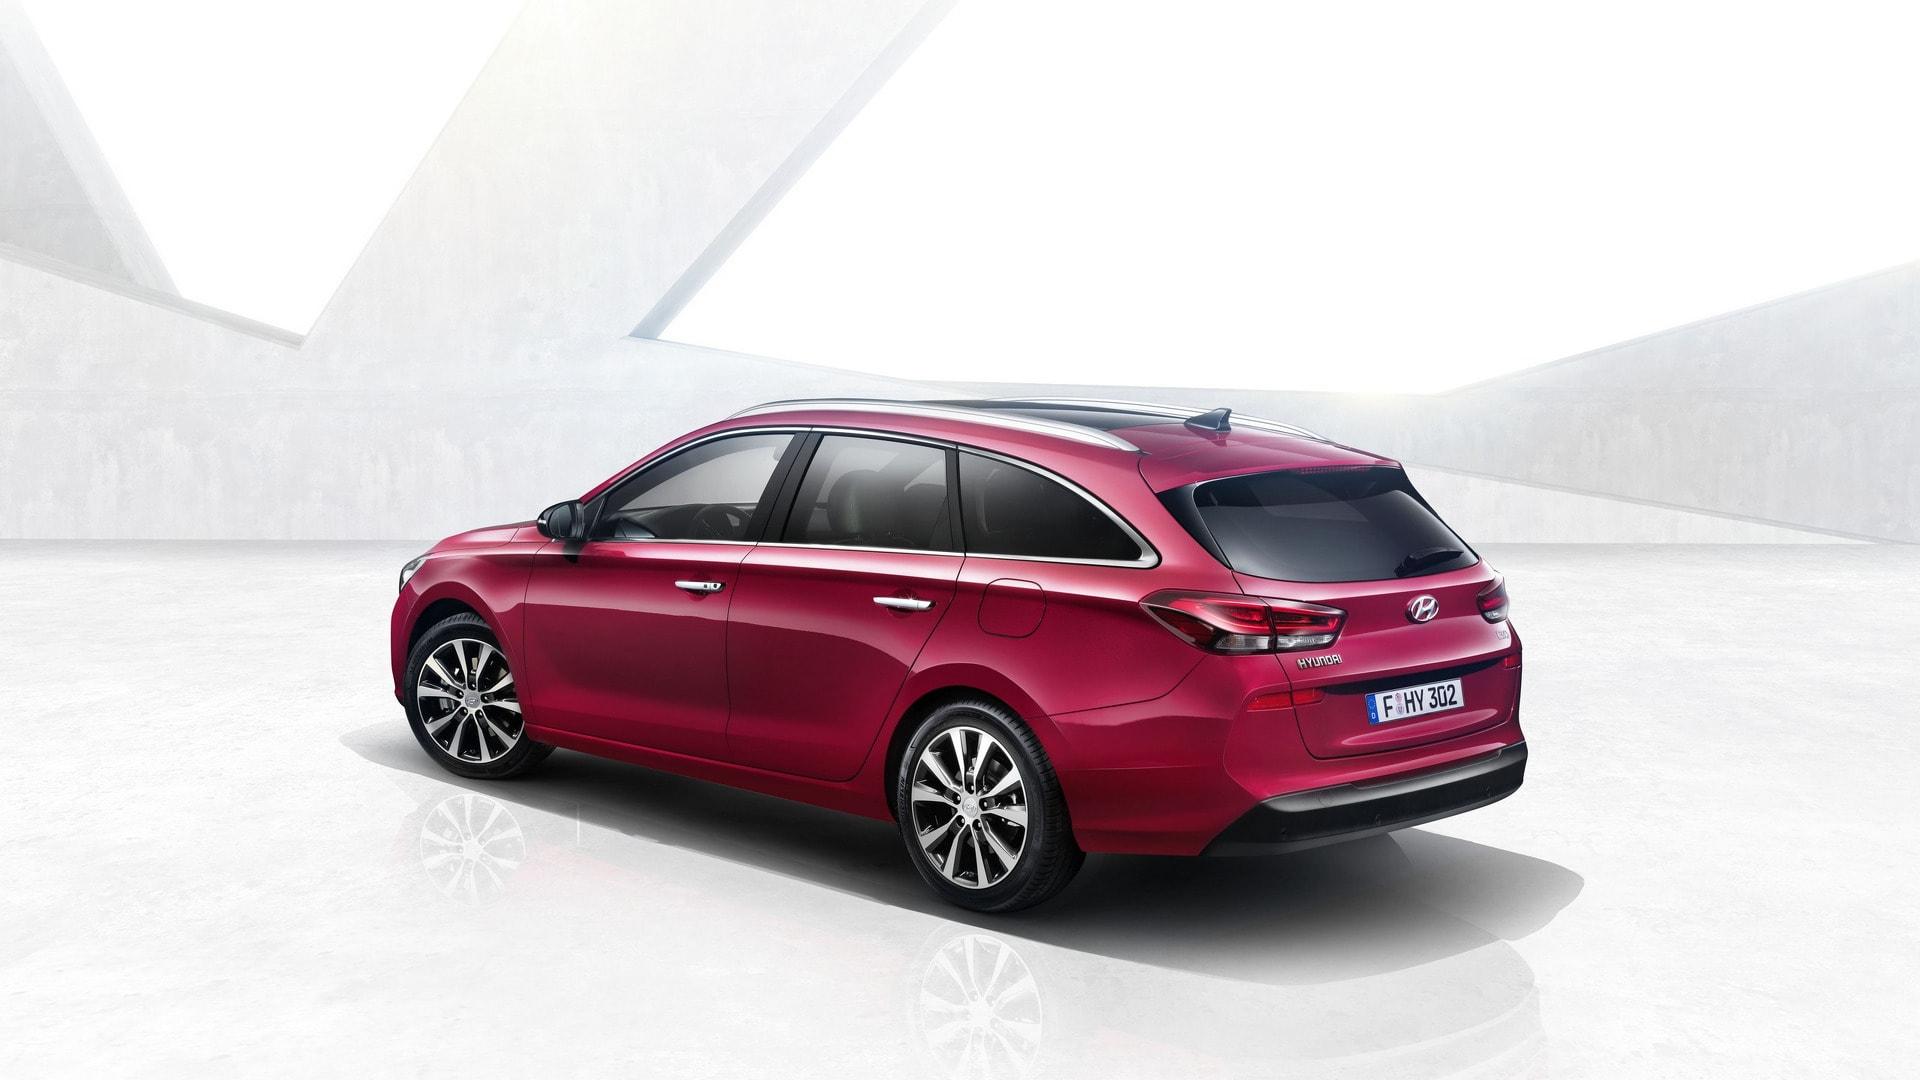 2017-hyundai-i30-wagon-4